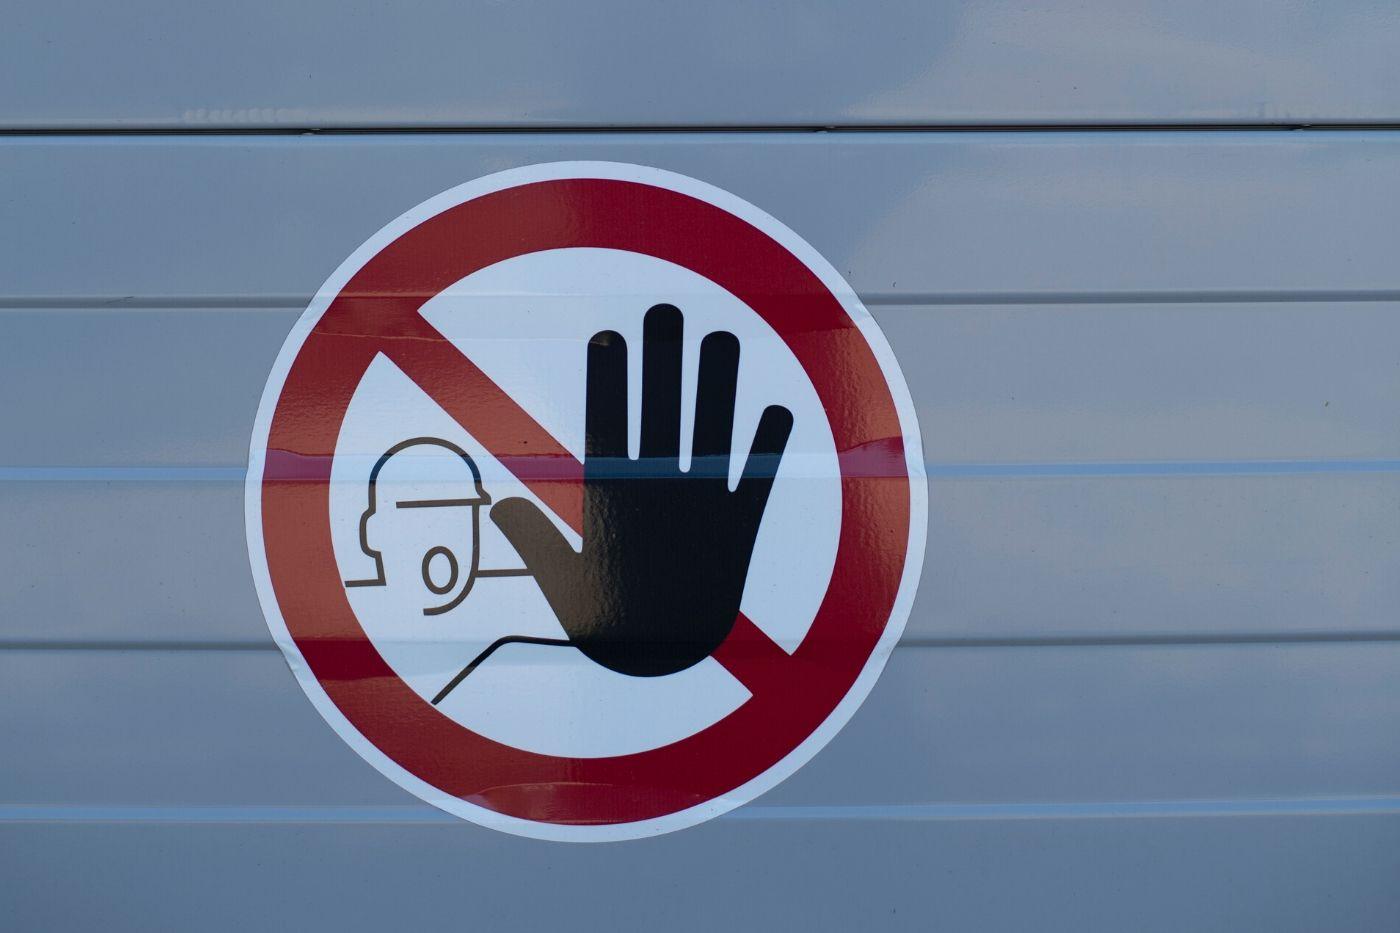 safety warning sign